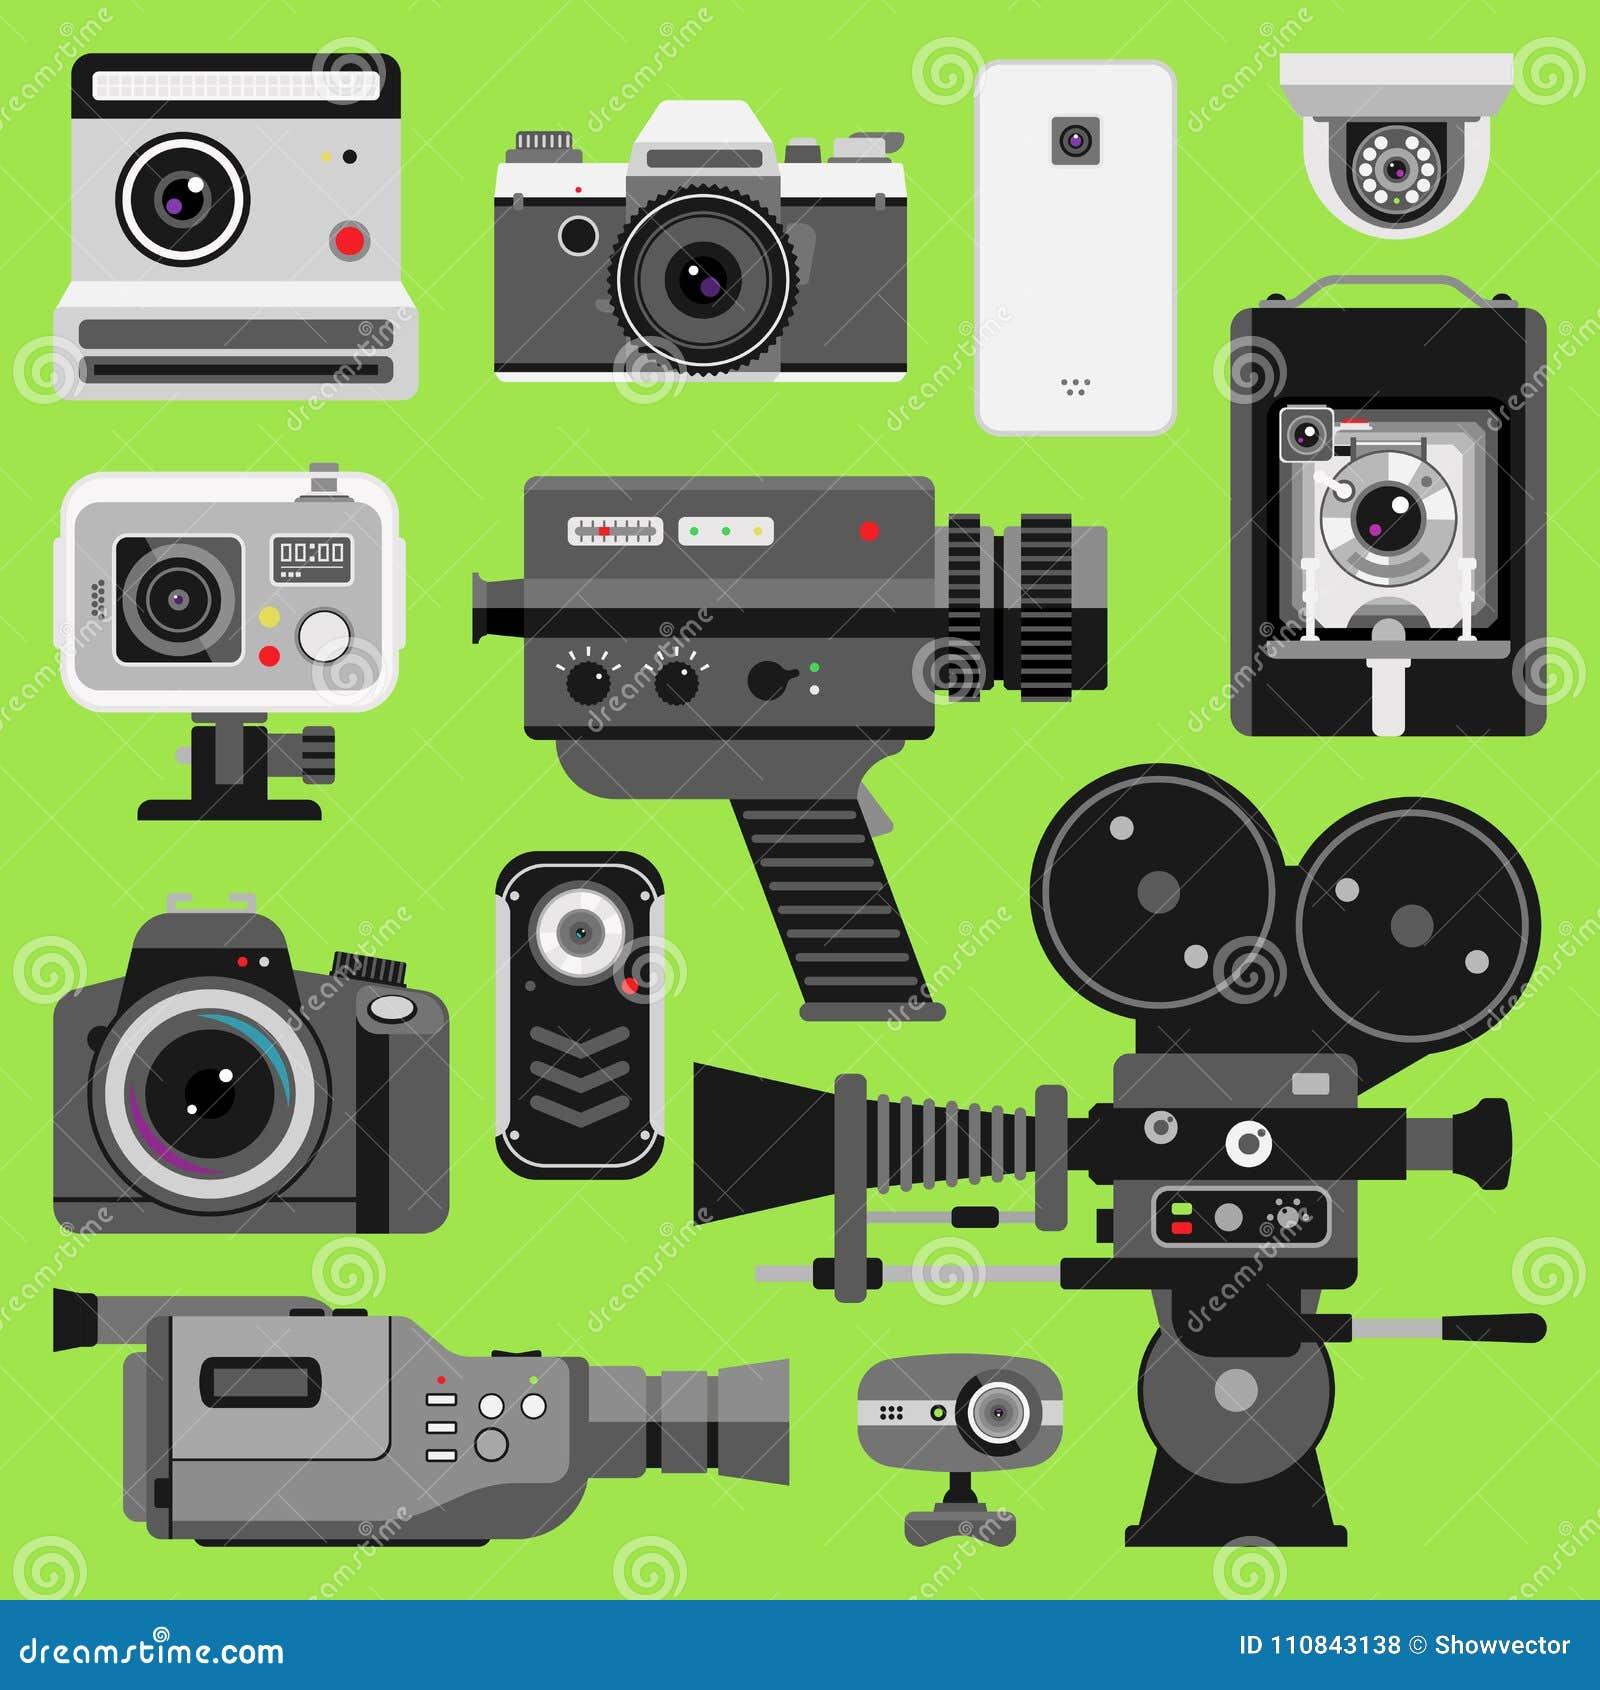 Photo Video Vector Camera Tools Optic Lenses Set Different Types Of Digital Cameras Objective Retro Equipment Professional Movie Film Making Technic